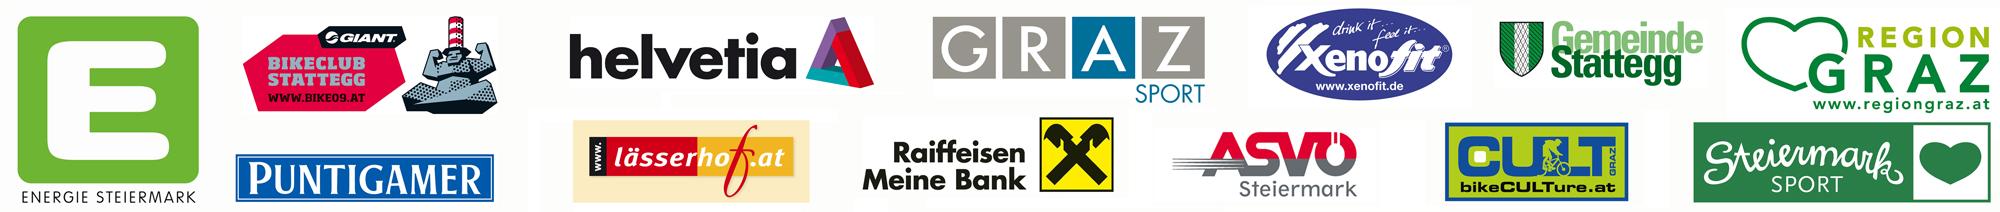 Foto auf Opening Graz/Stattegg